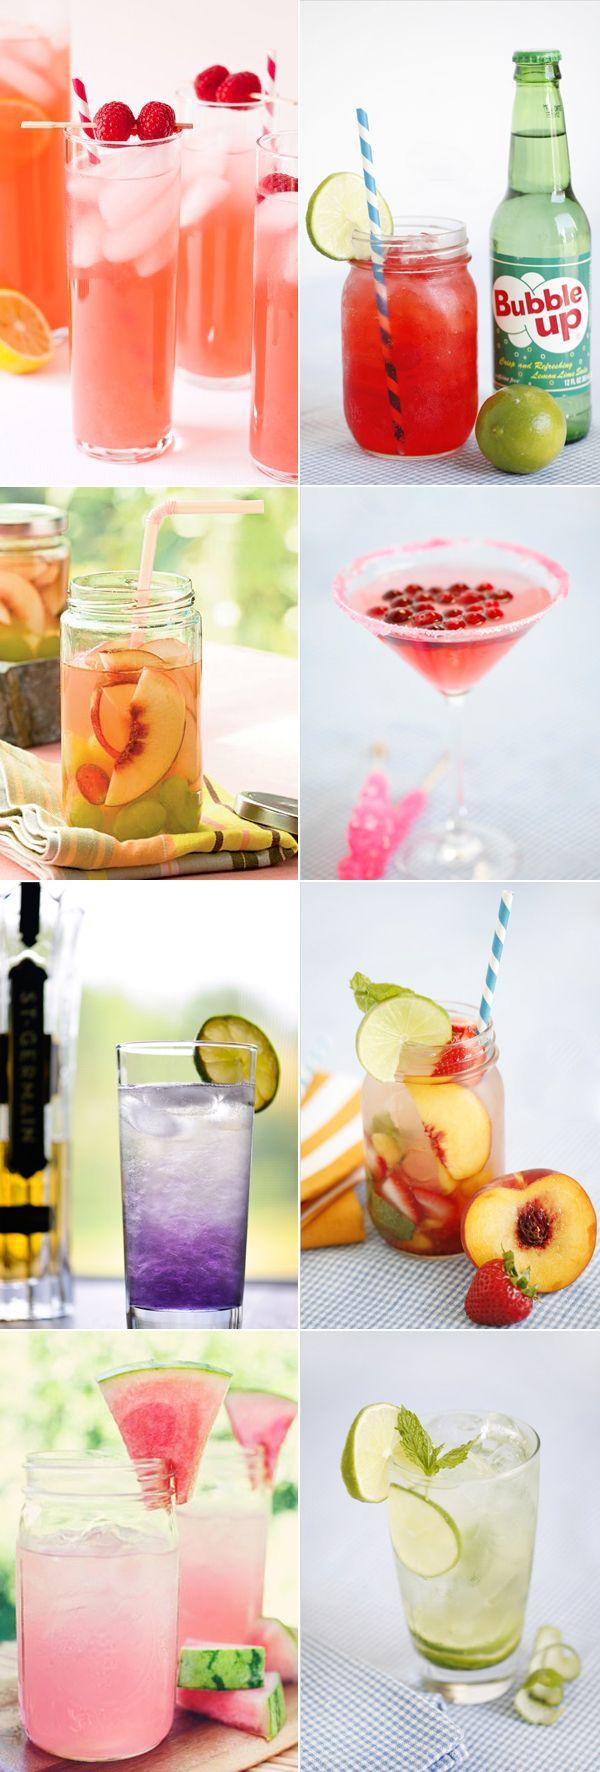 34 Creative Wedding Drinks - Fruity Drinks